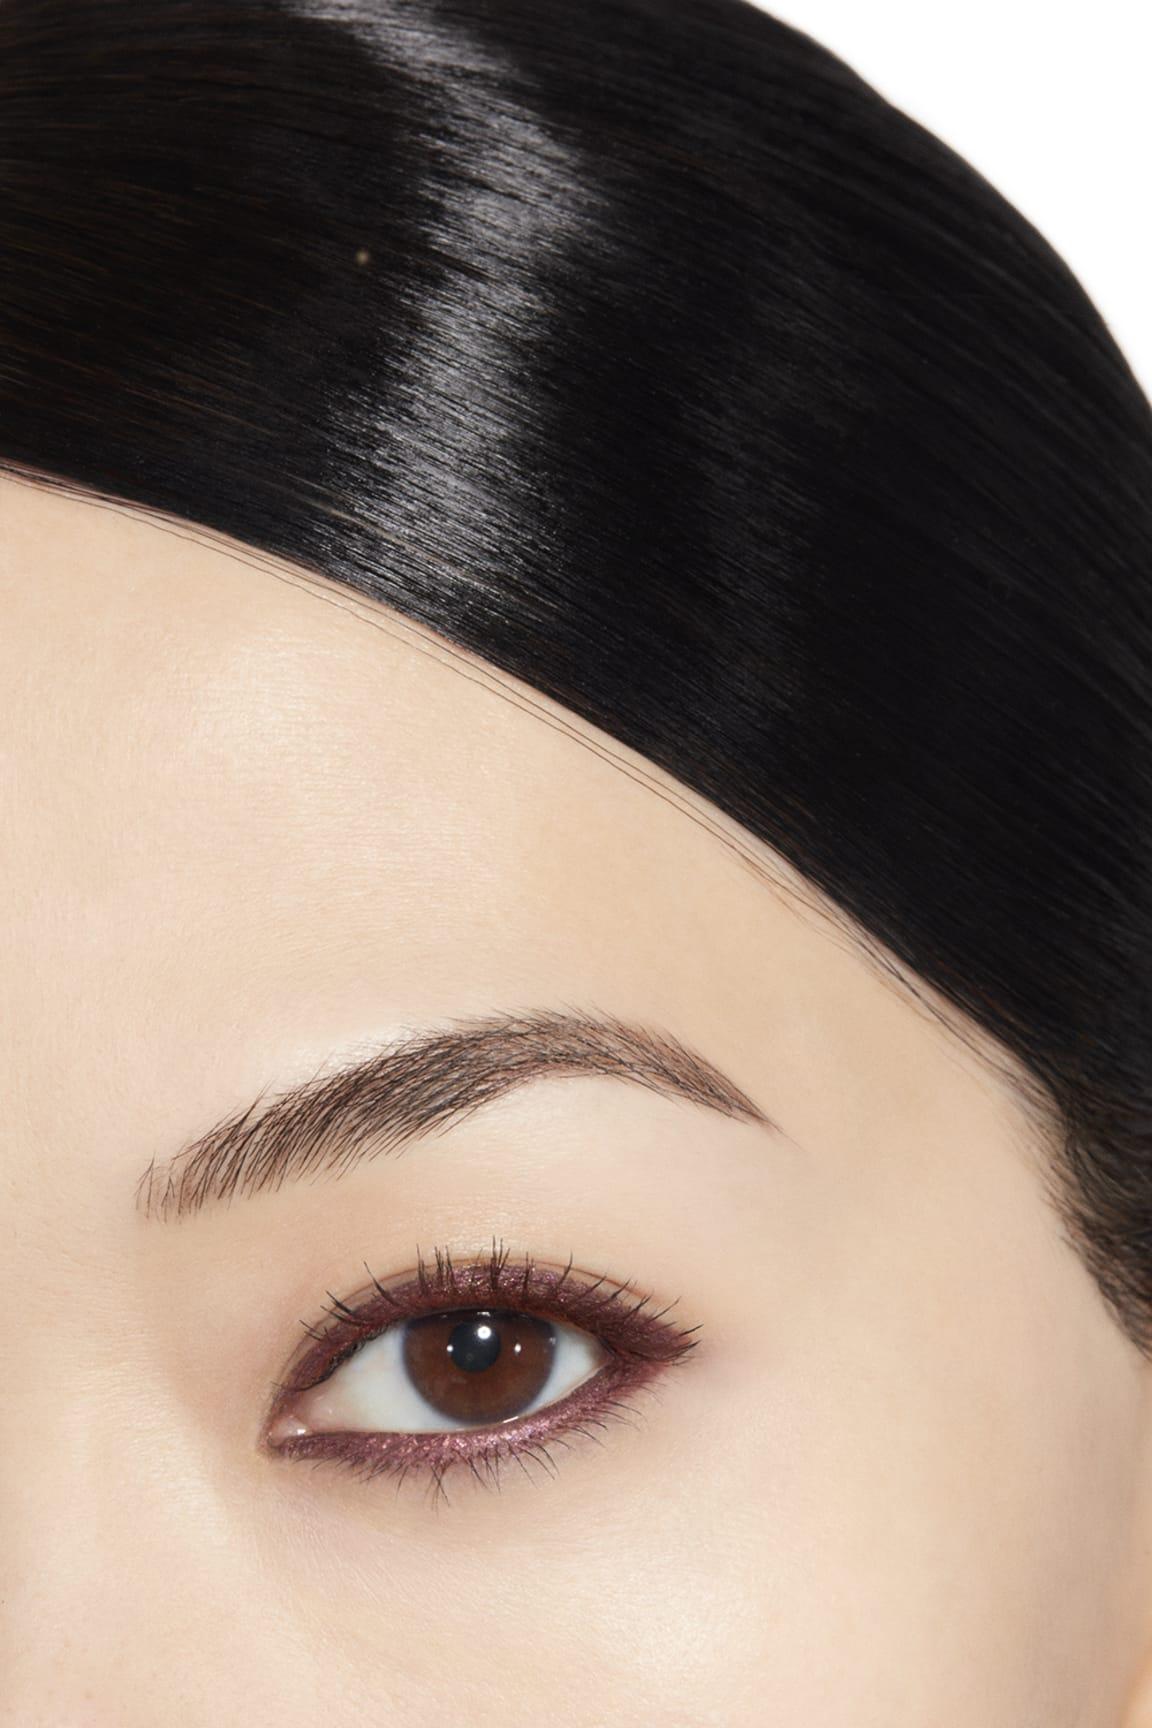 Application makeup visual 1 - STYLO YEUX WATERPROOF 955 - ROMANCE